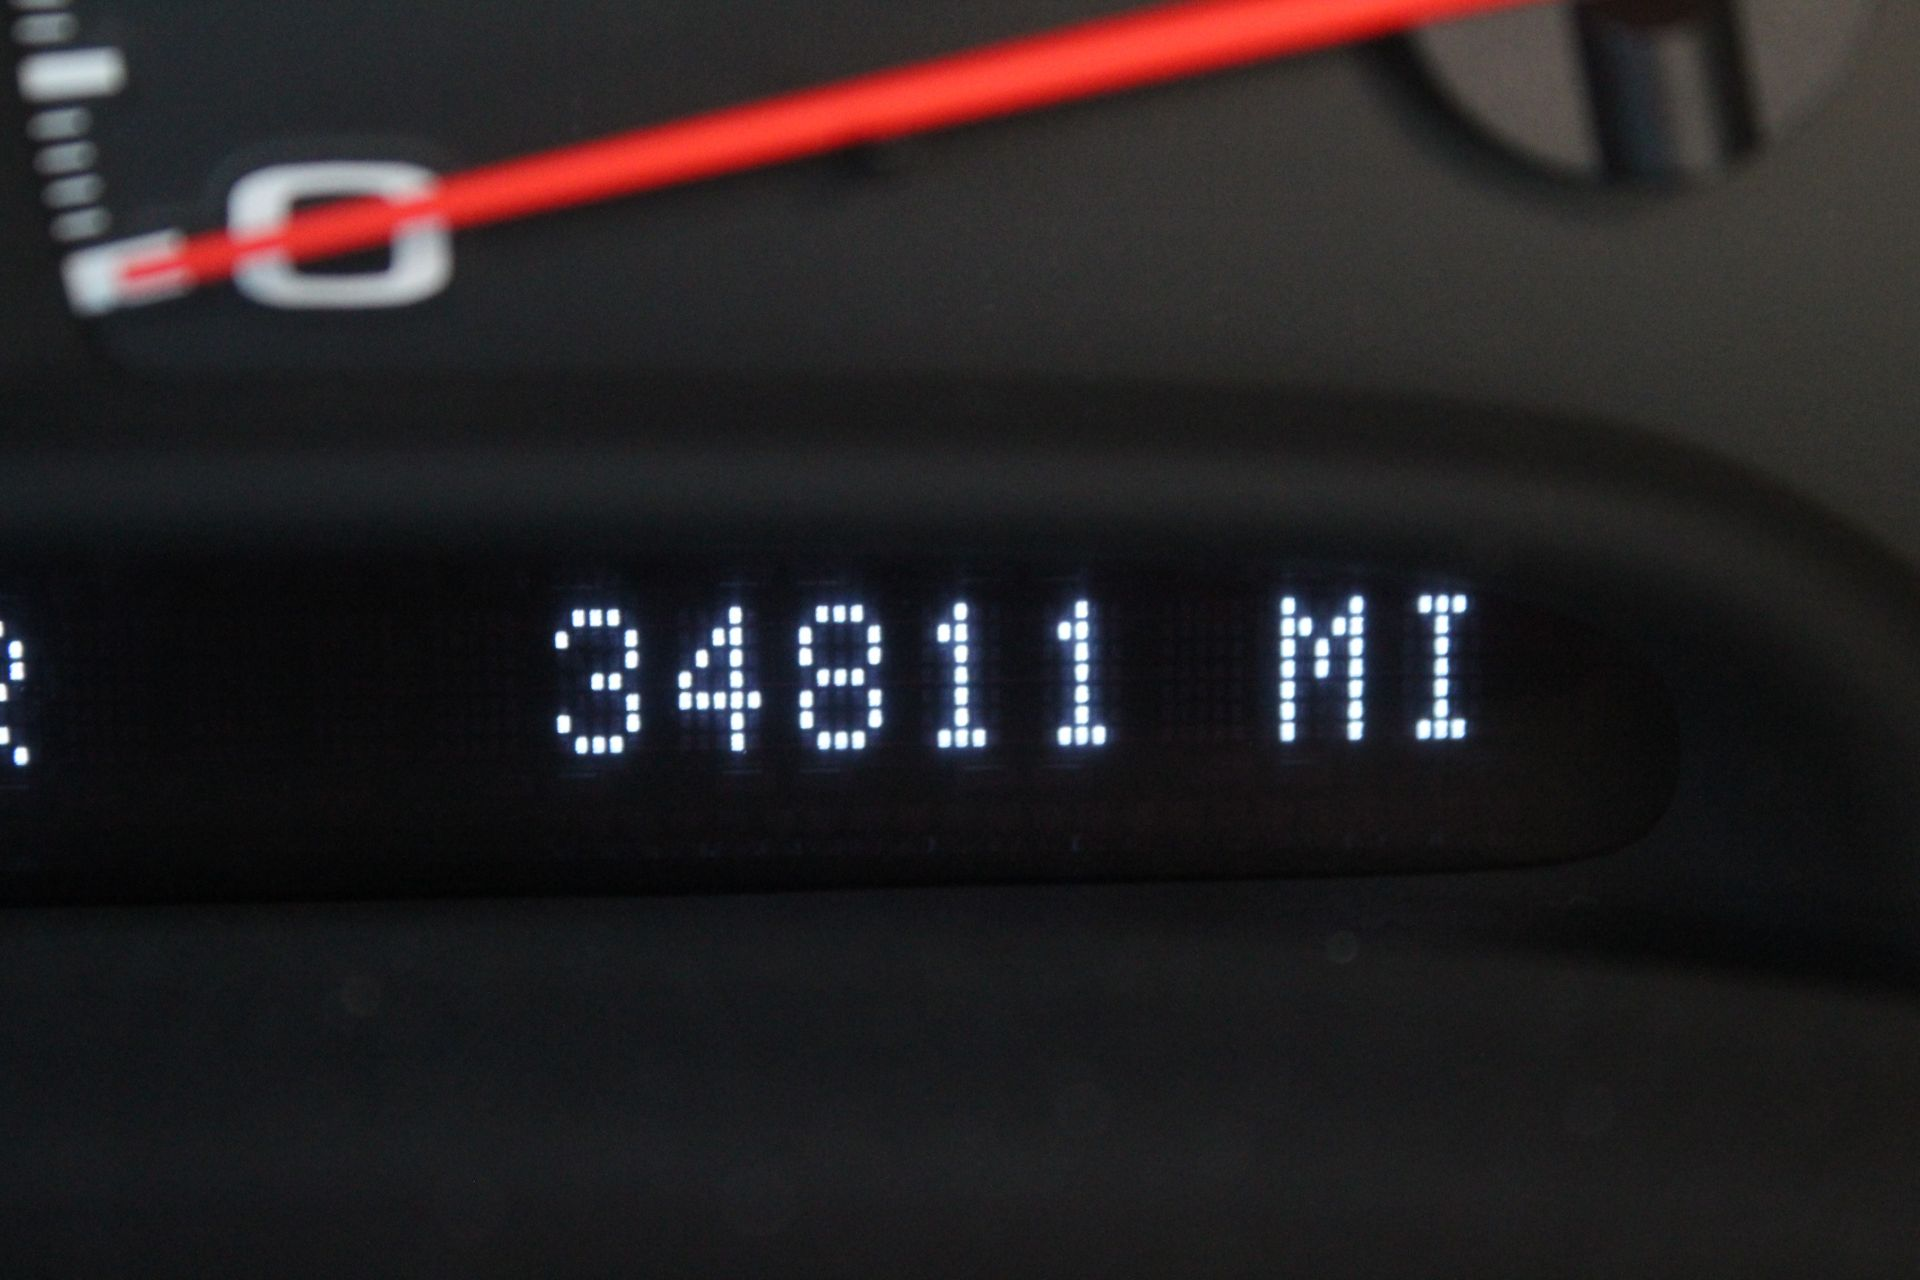 2000 CHEVROLET CORVETTE COUPE, 5.7L V-8, AUTO., VIN 1G1YY22G1Y5122391, 34,811 MILES SHOWN ON - Image 12 of 17